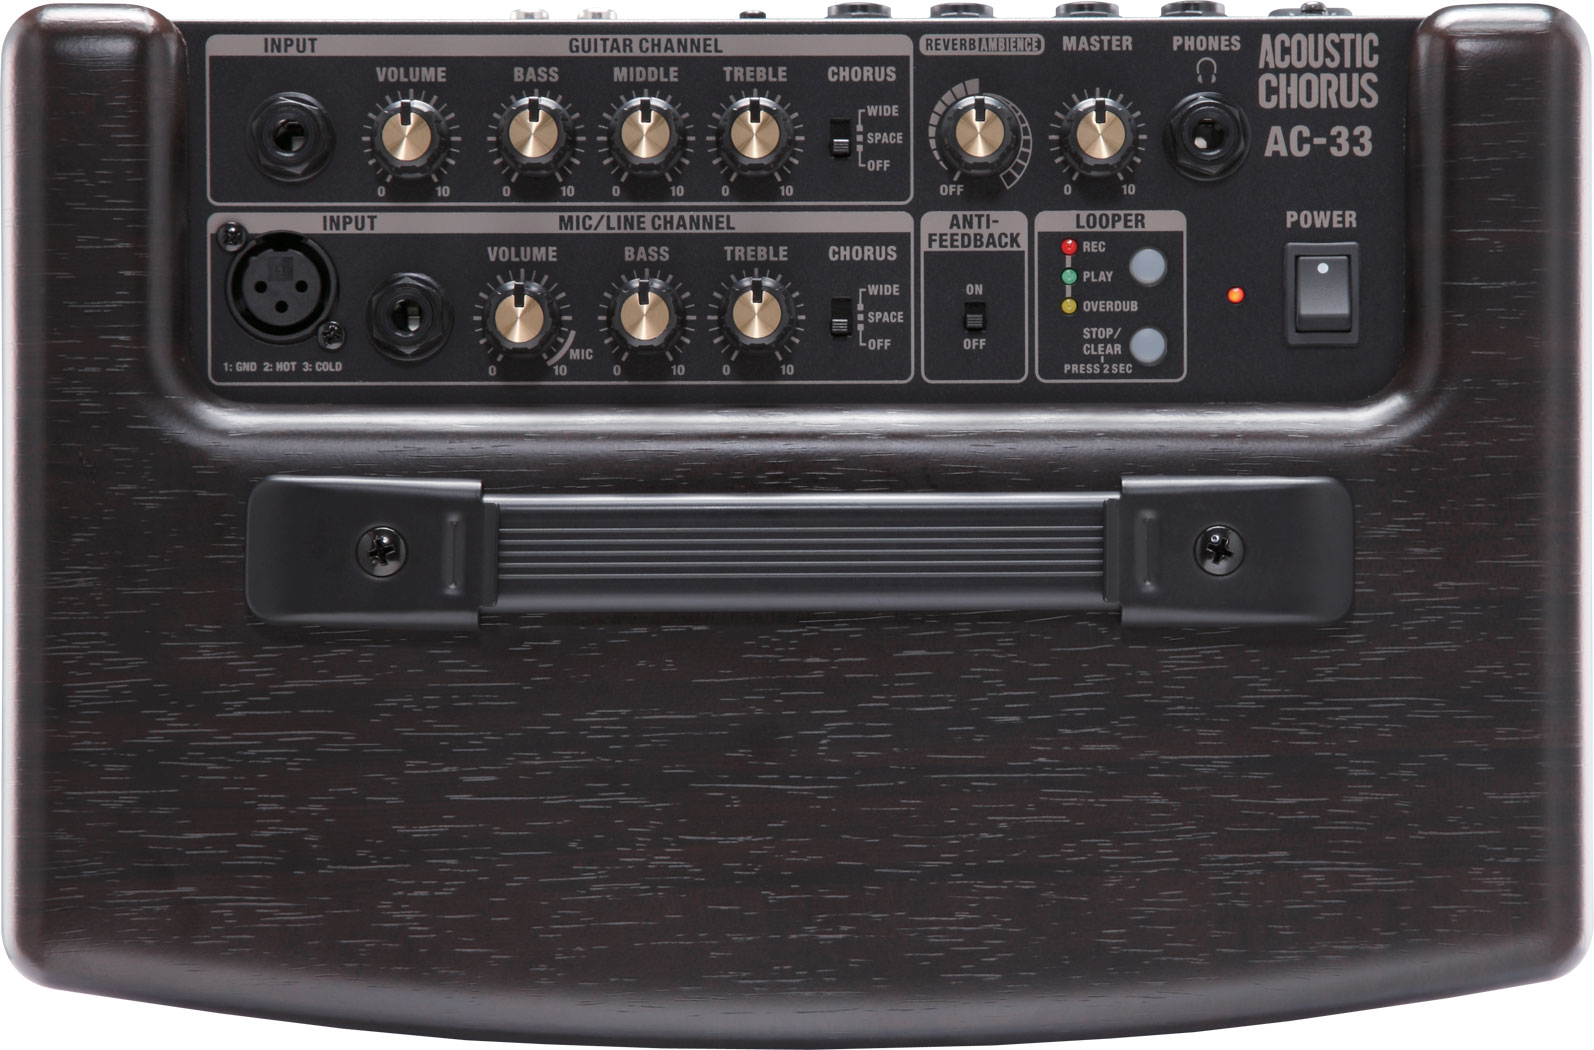 roland ac 33 acoustic chorus guitar amplifier rh roland ca roland a-33 service manual roland a-33 manual pdf